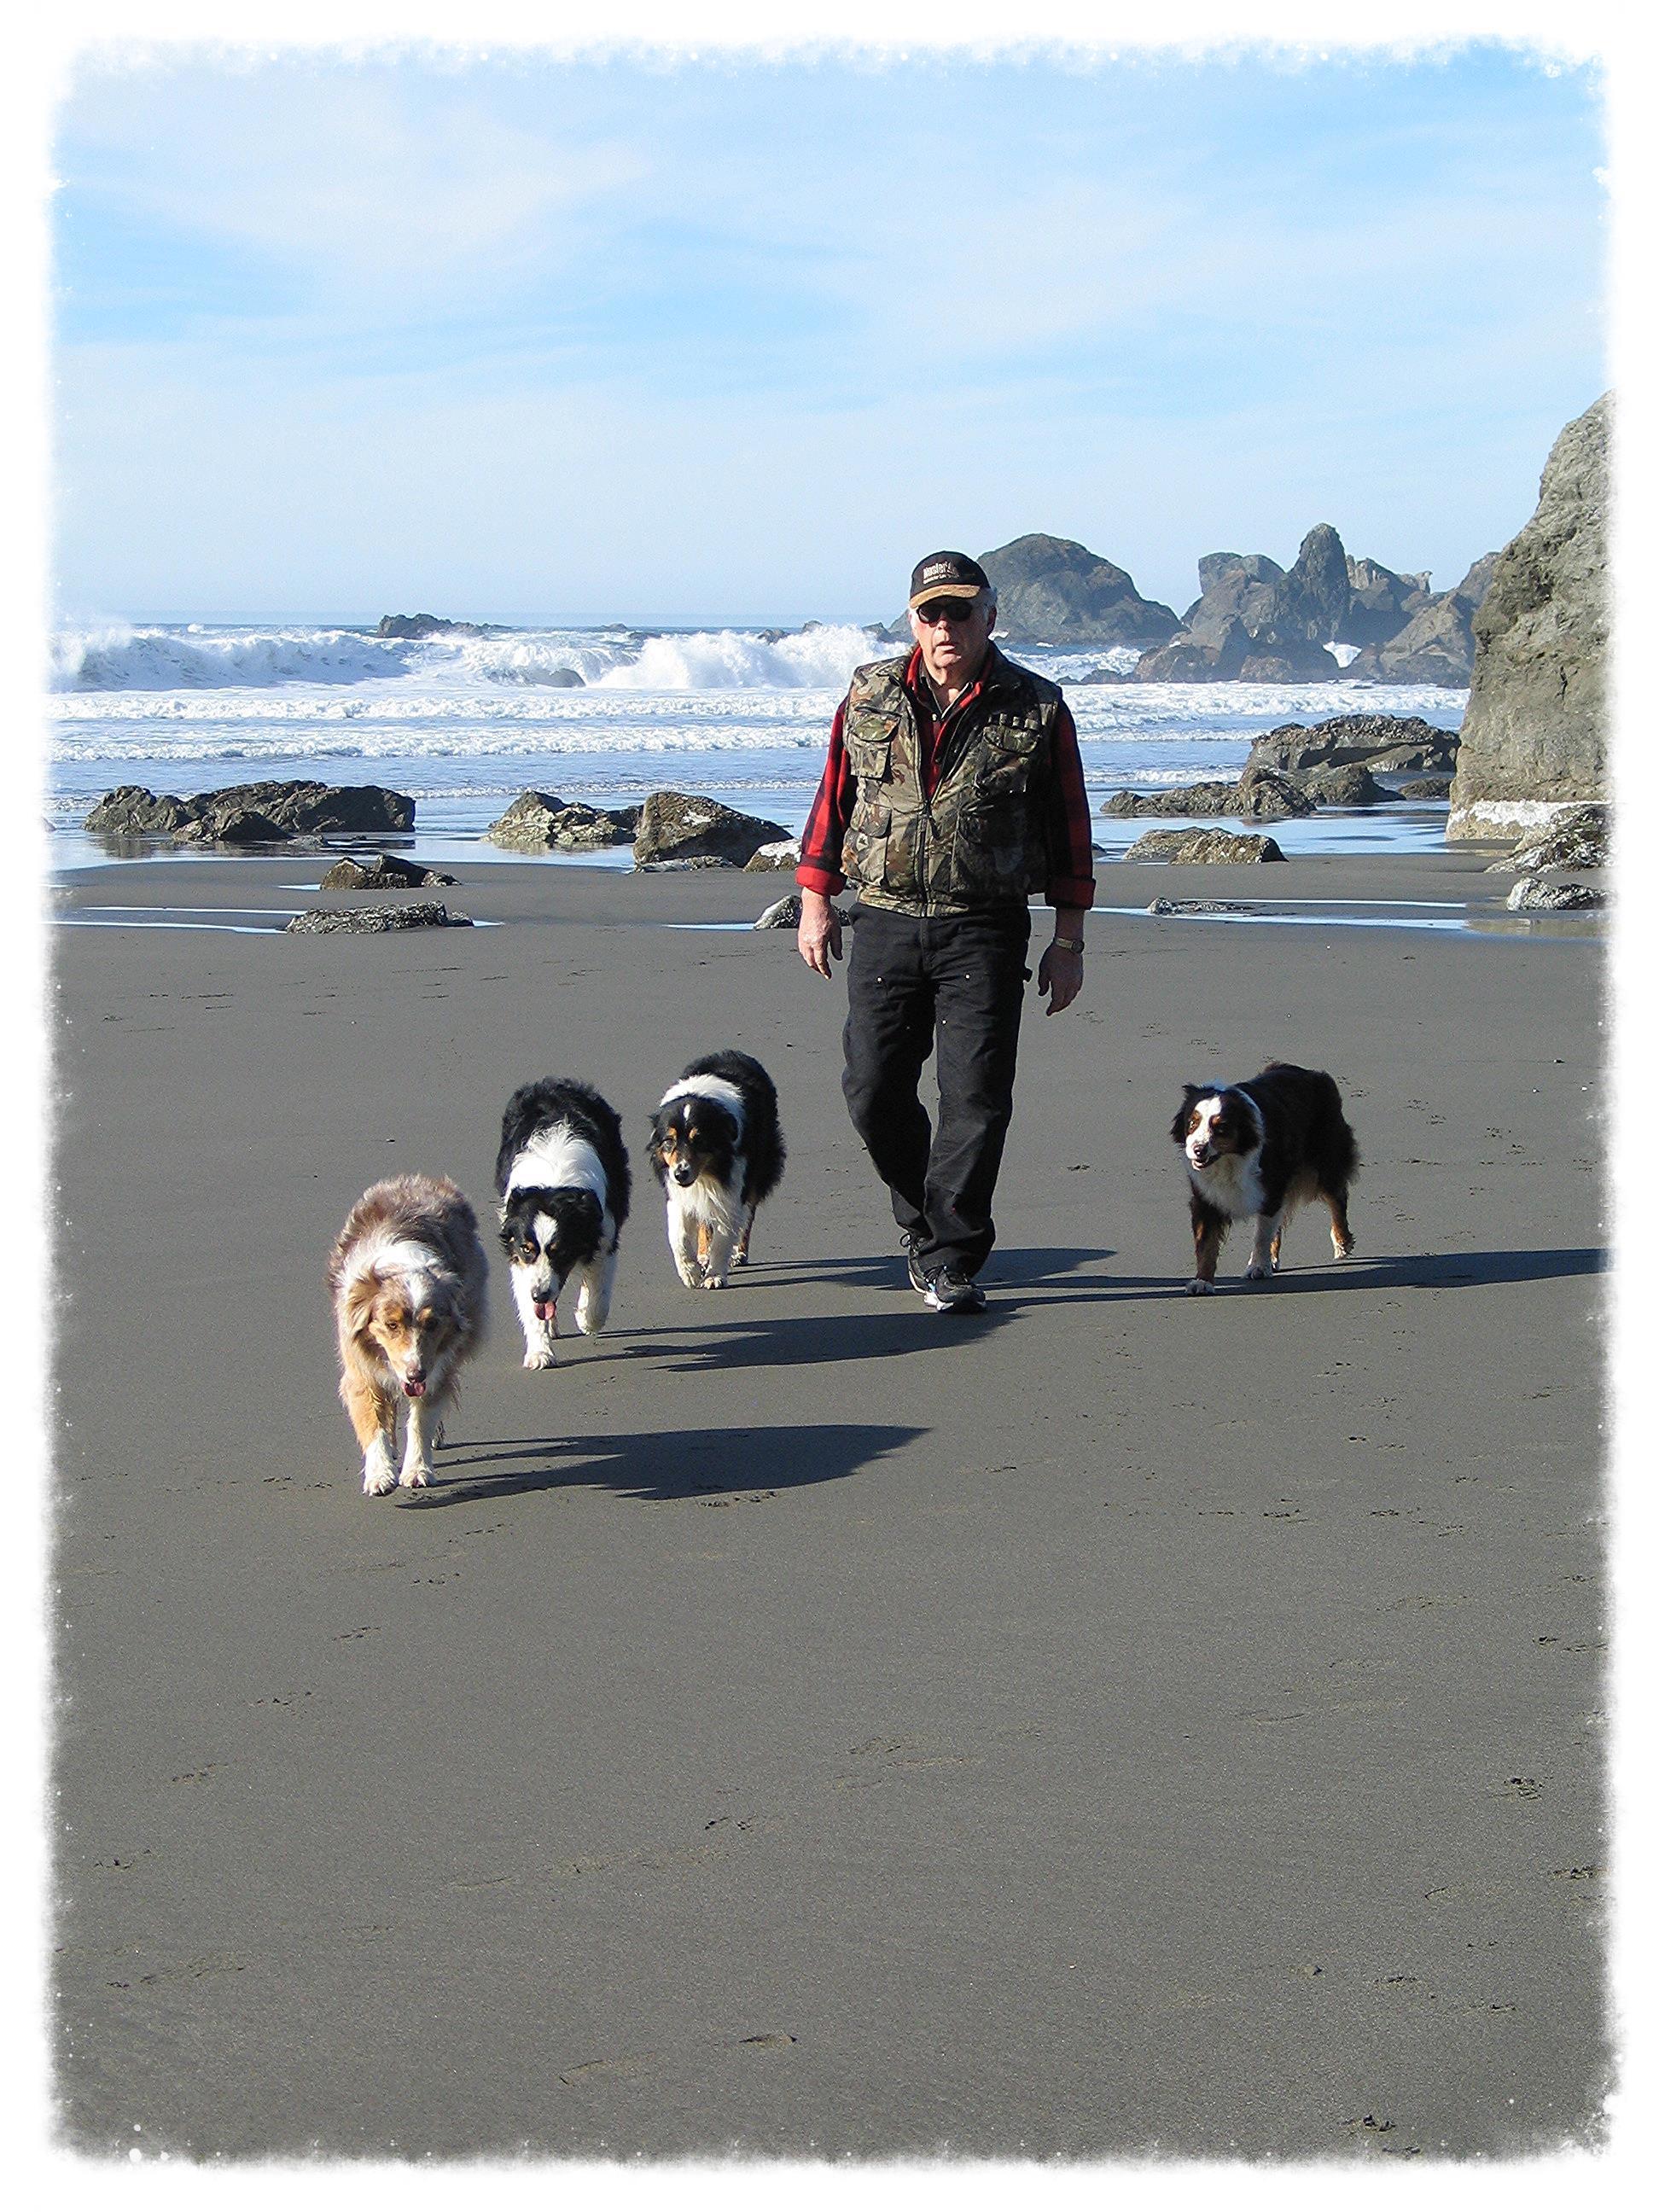 Katy, Nitro, Cruiser, Leonard and Hellon at Lone Ranch Beach, our favorite beach, near Brookings, Oregon. Spring 2013